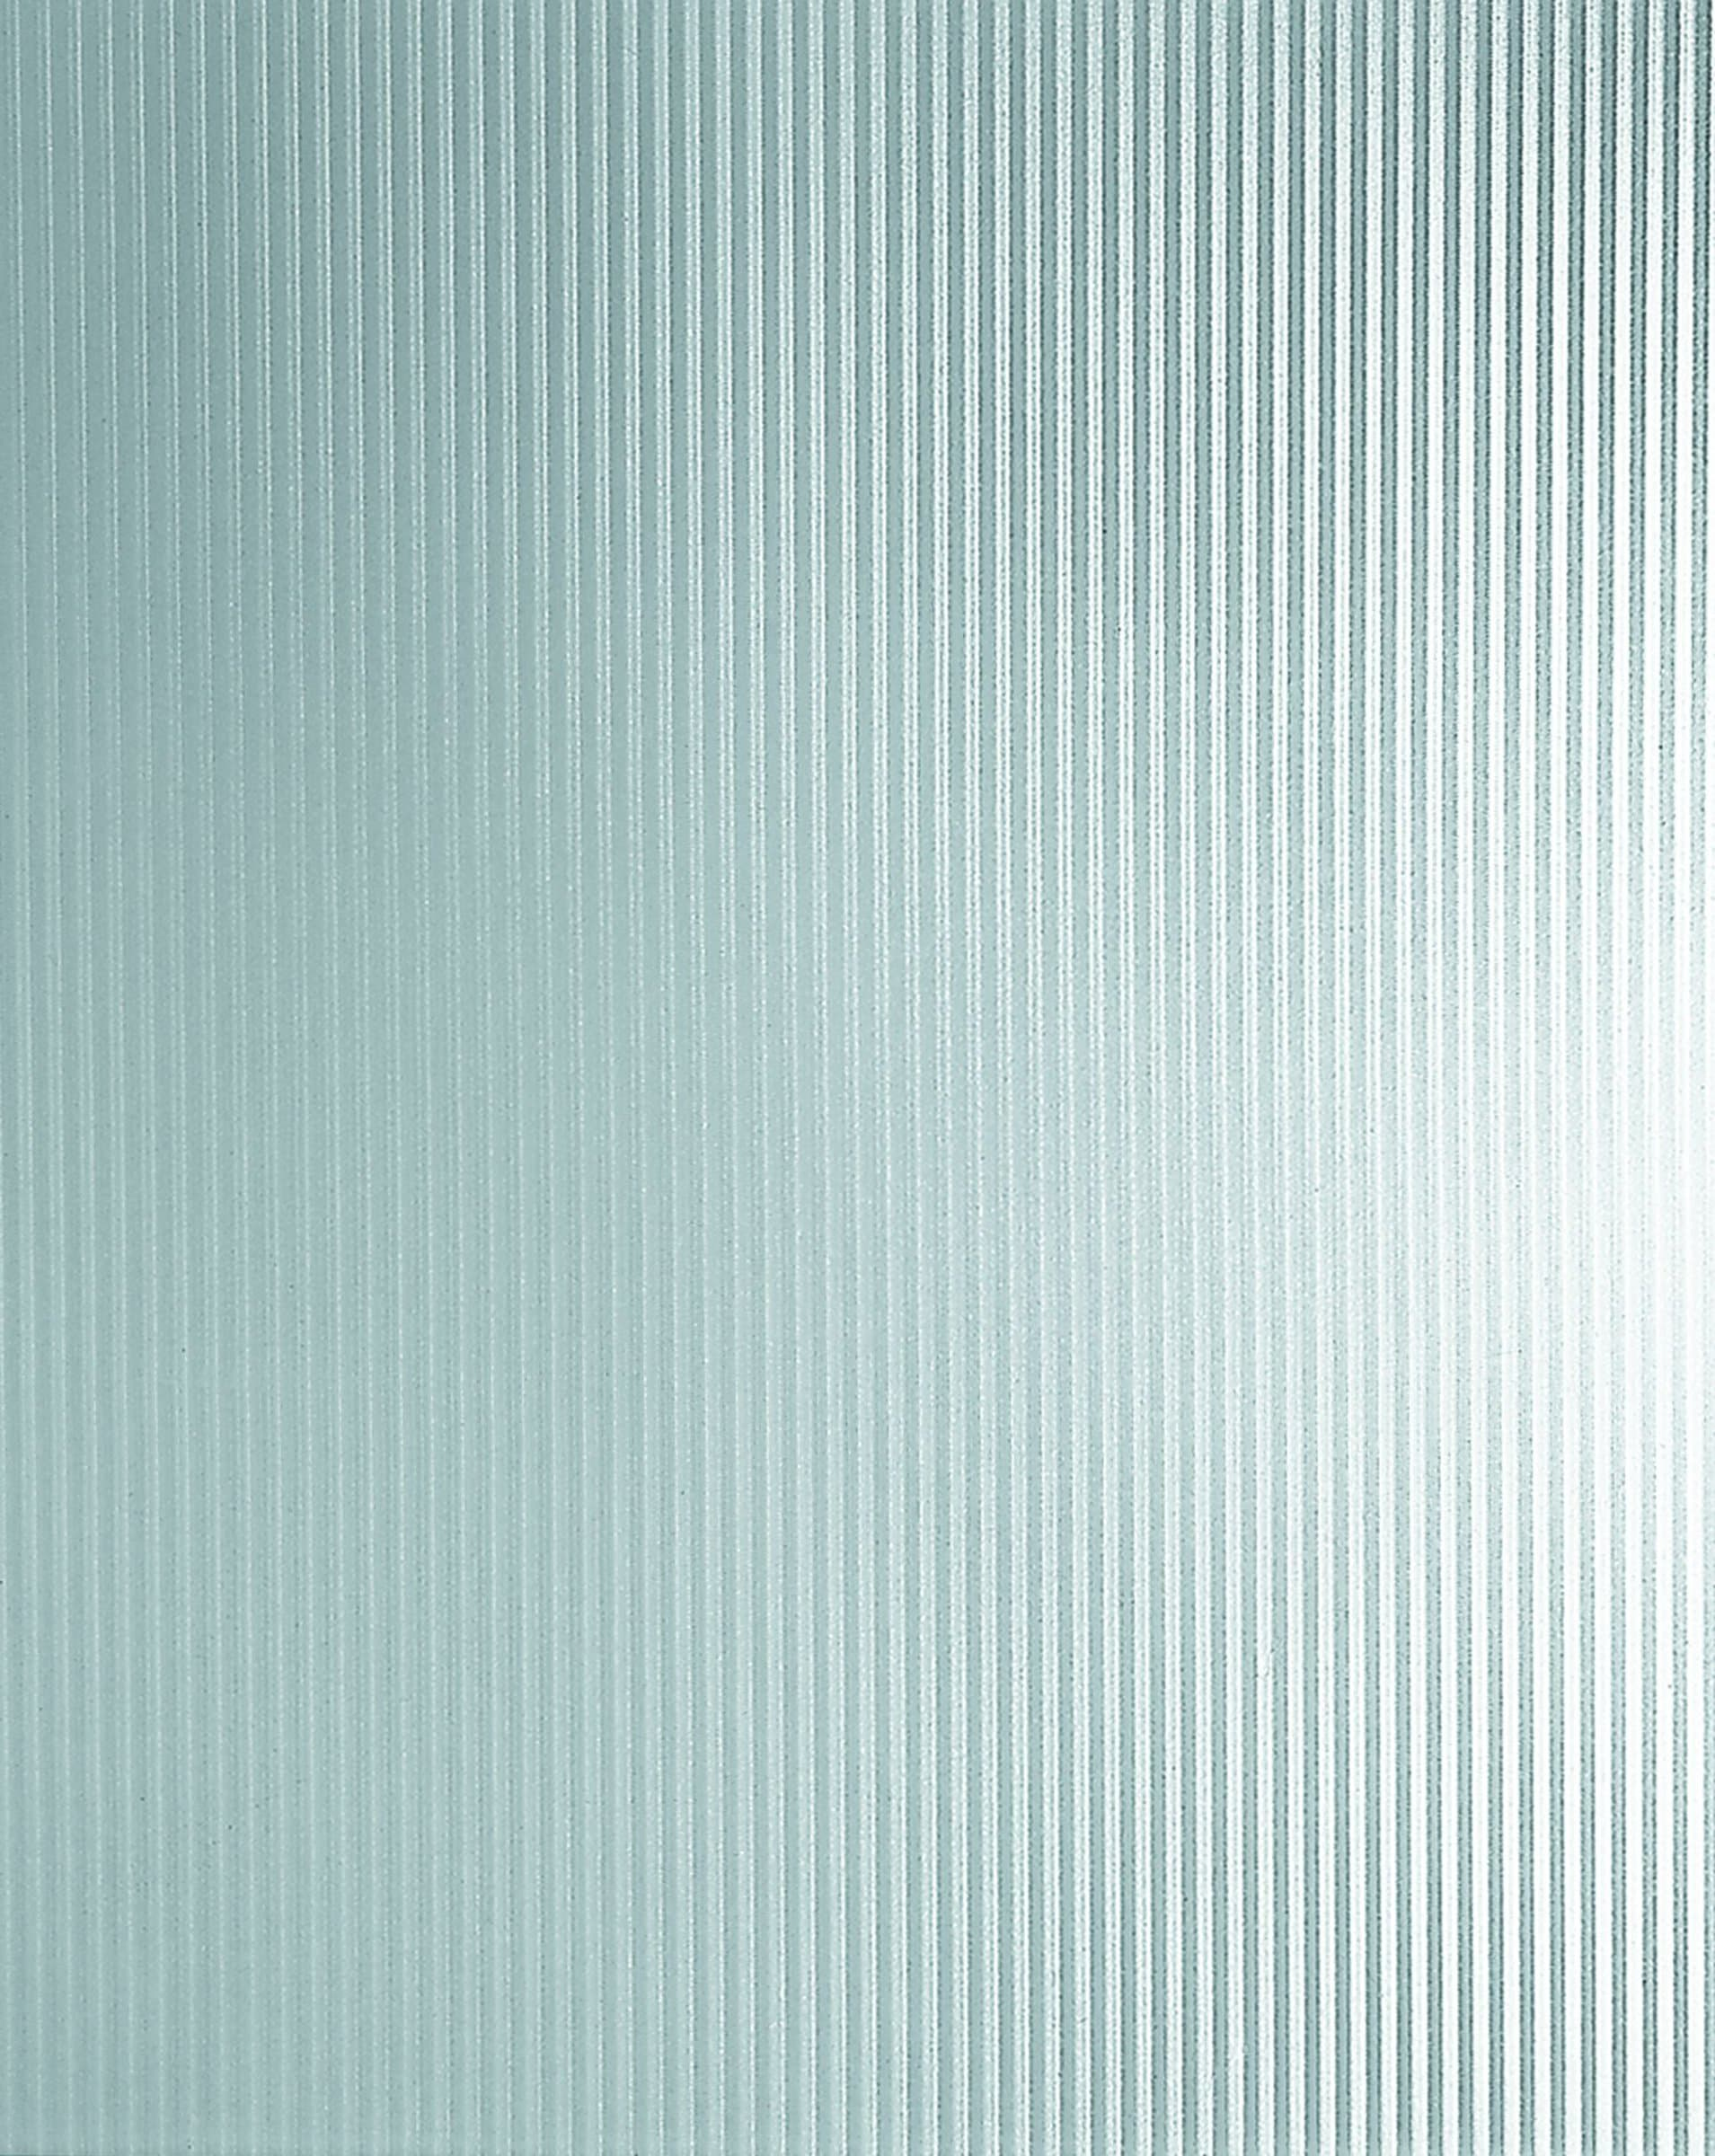 D c fix dekofolien selbstklebend stripes gepr gt migros for Dekofolien selbstklebend